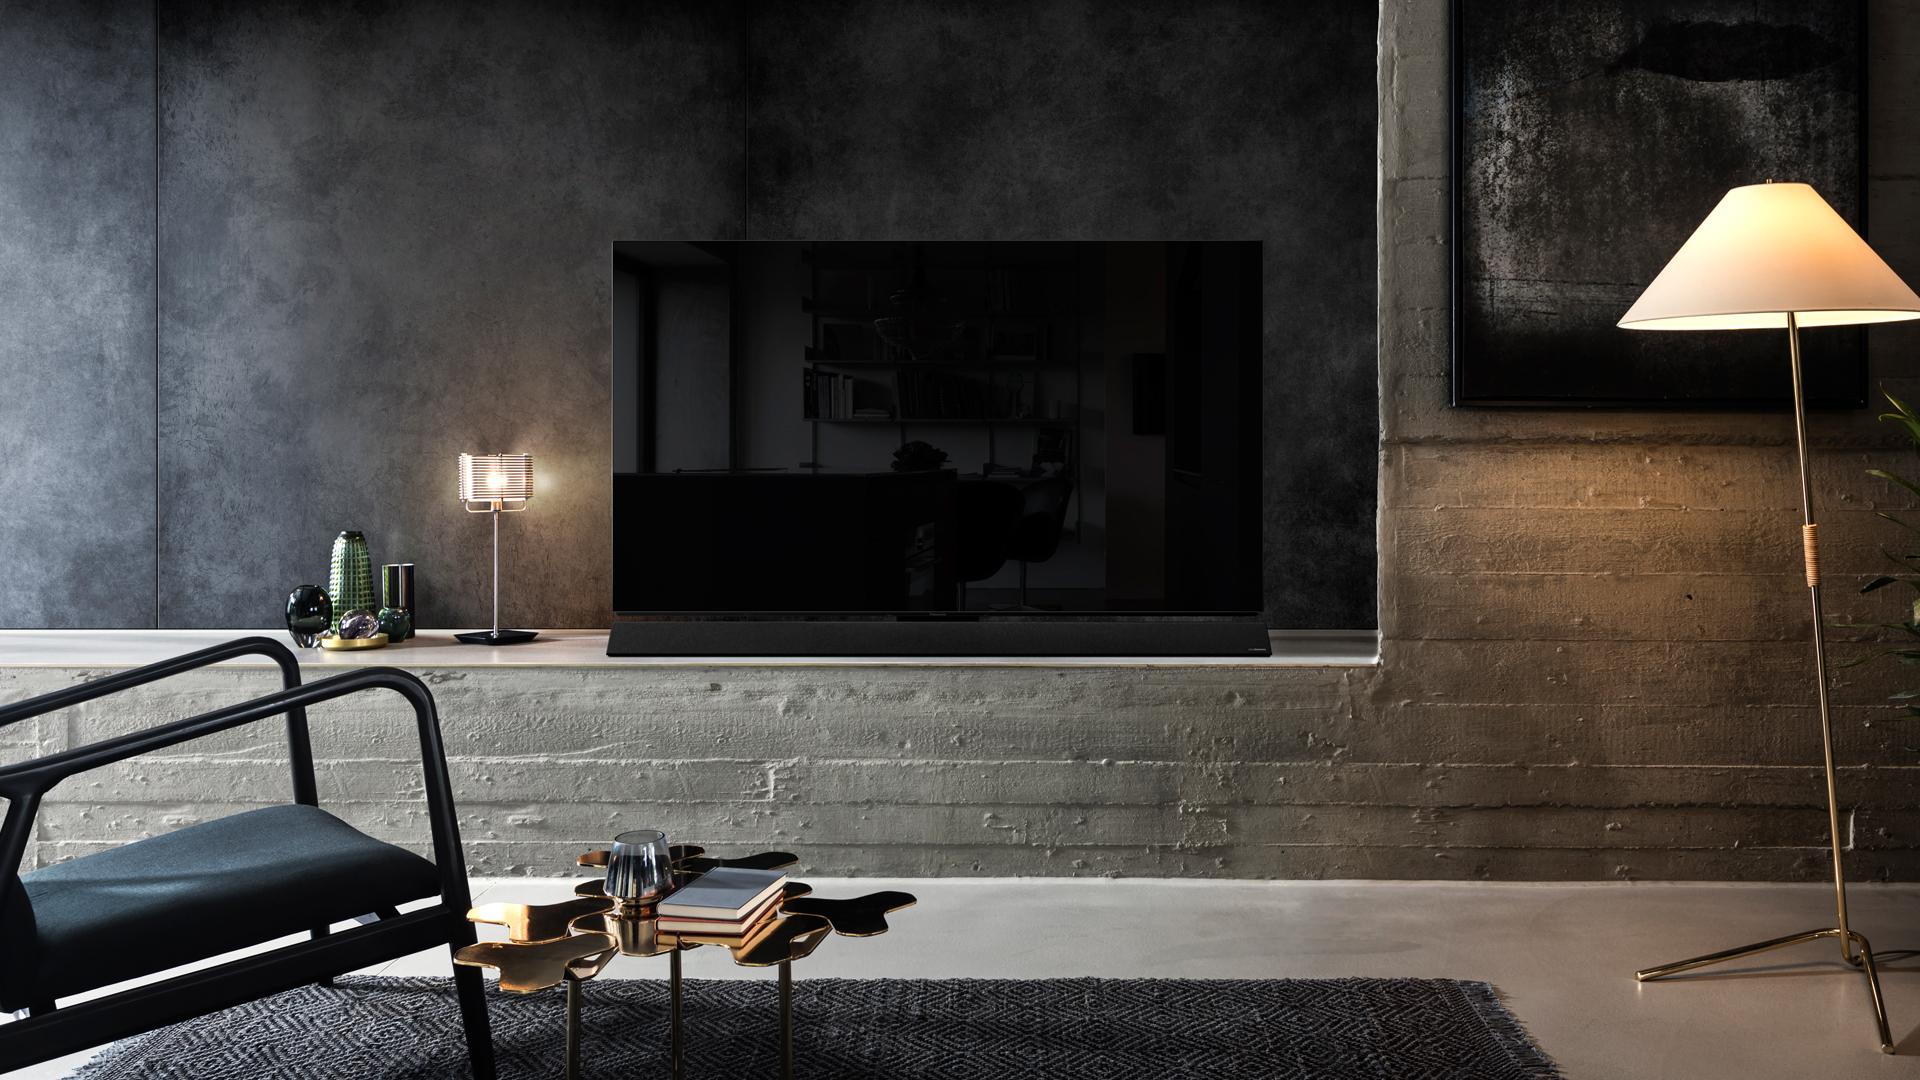 Panasonic FZ952/FZ950 4K TV